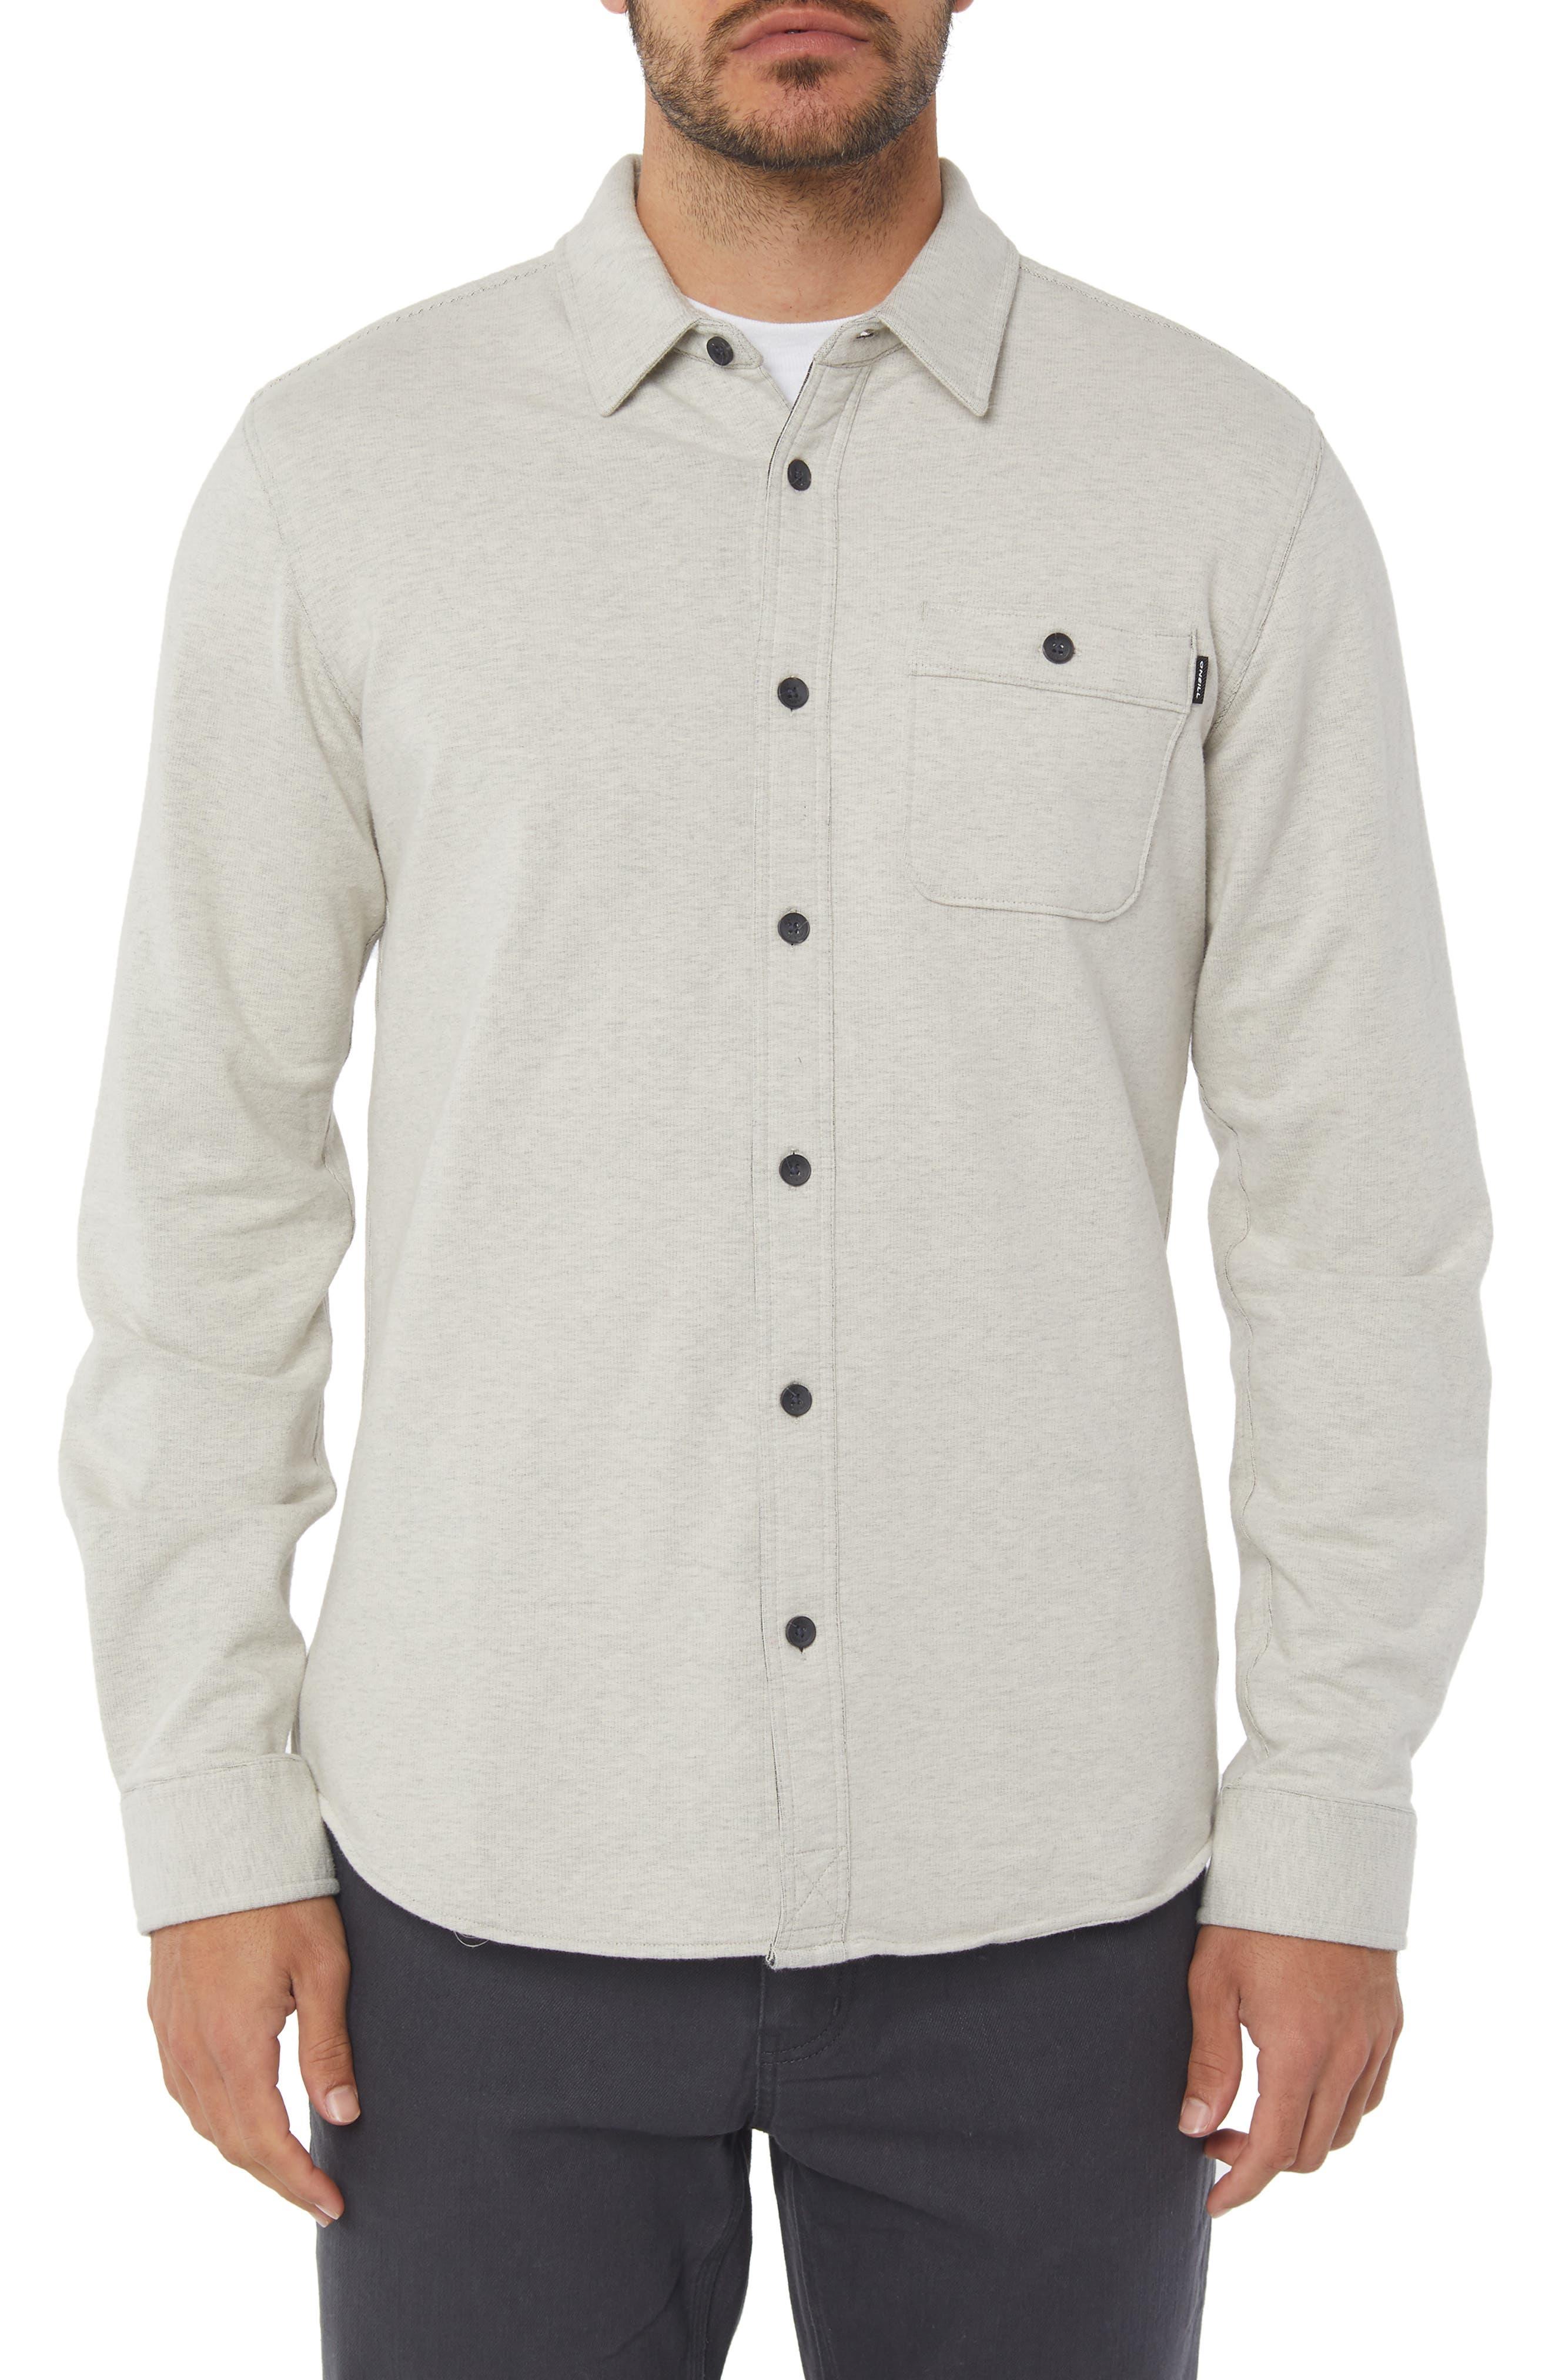 Anton Long Sleeve Shirt,                         Main,                         color, 020